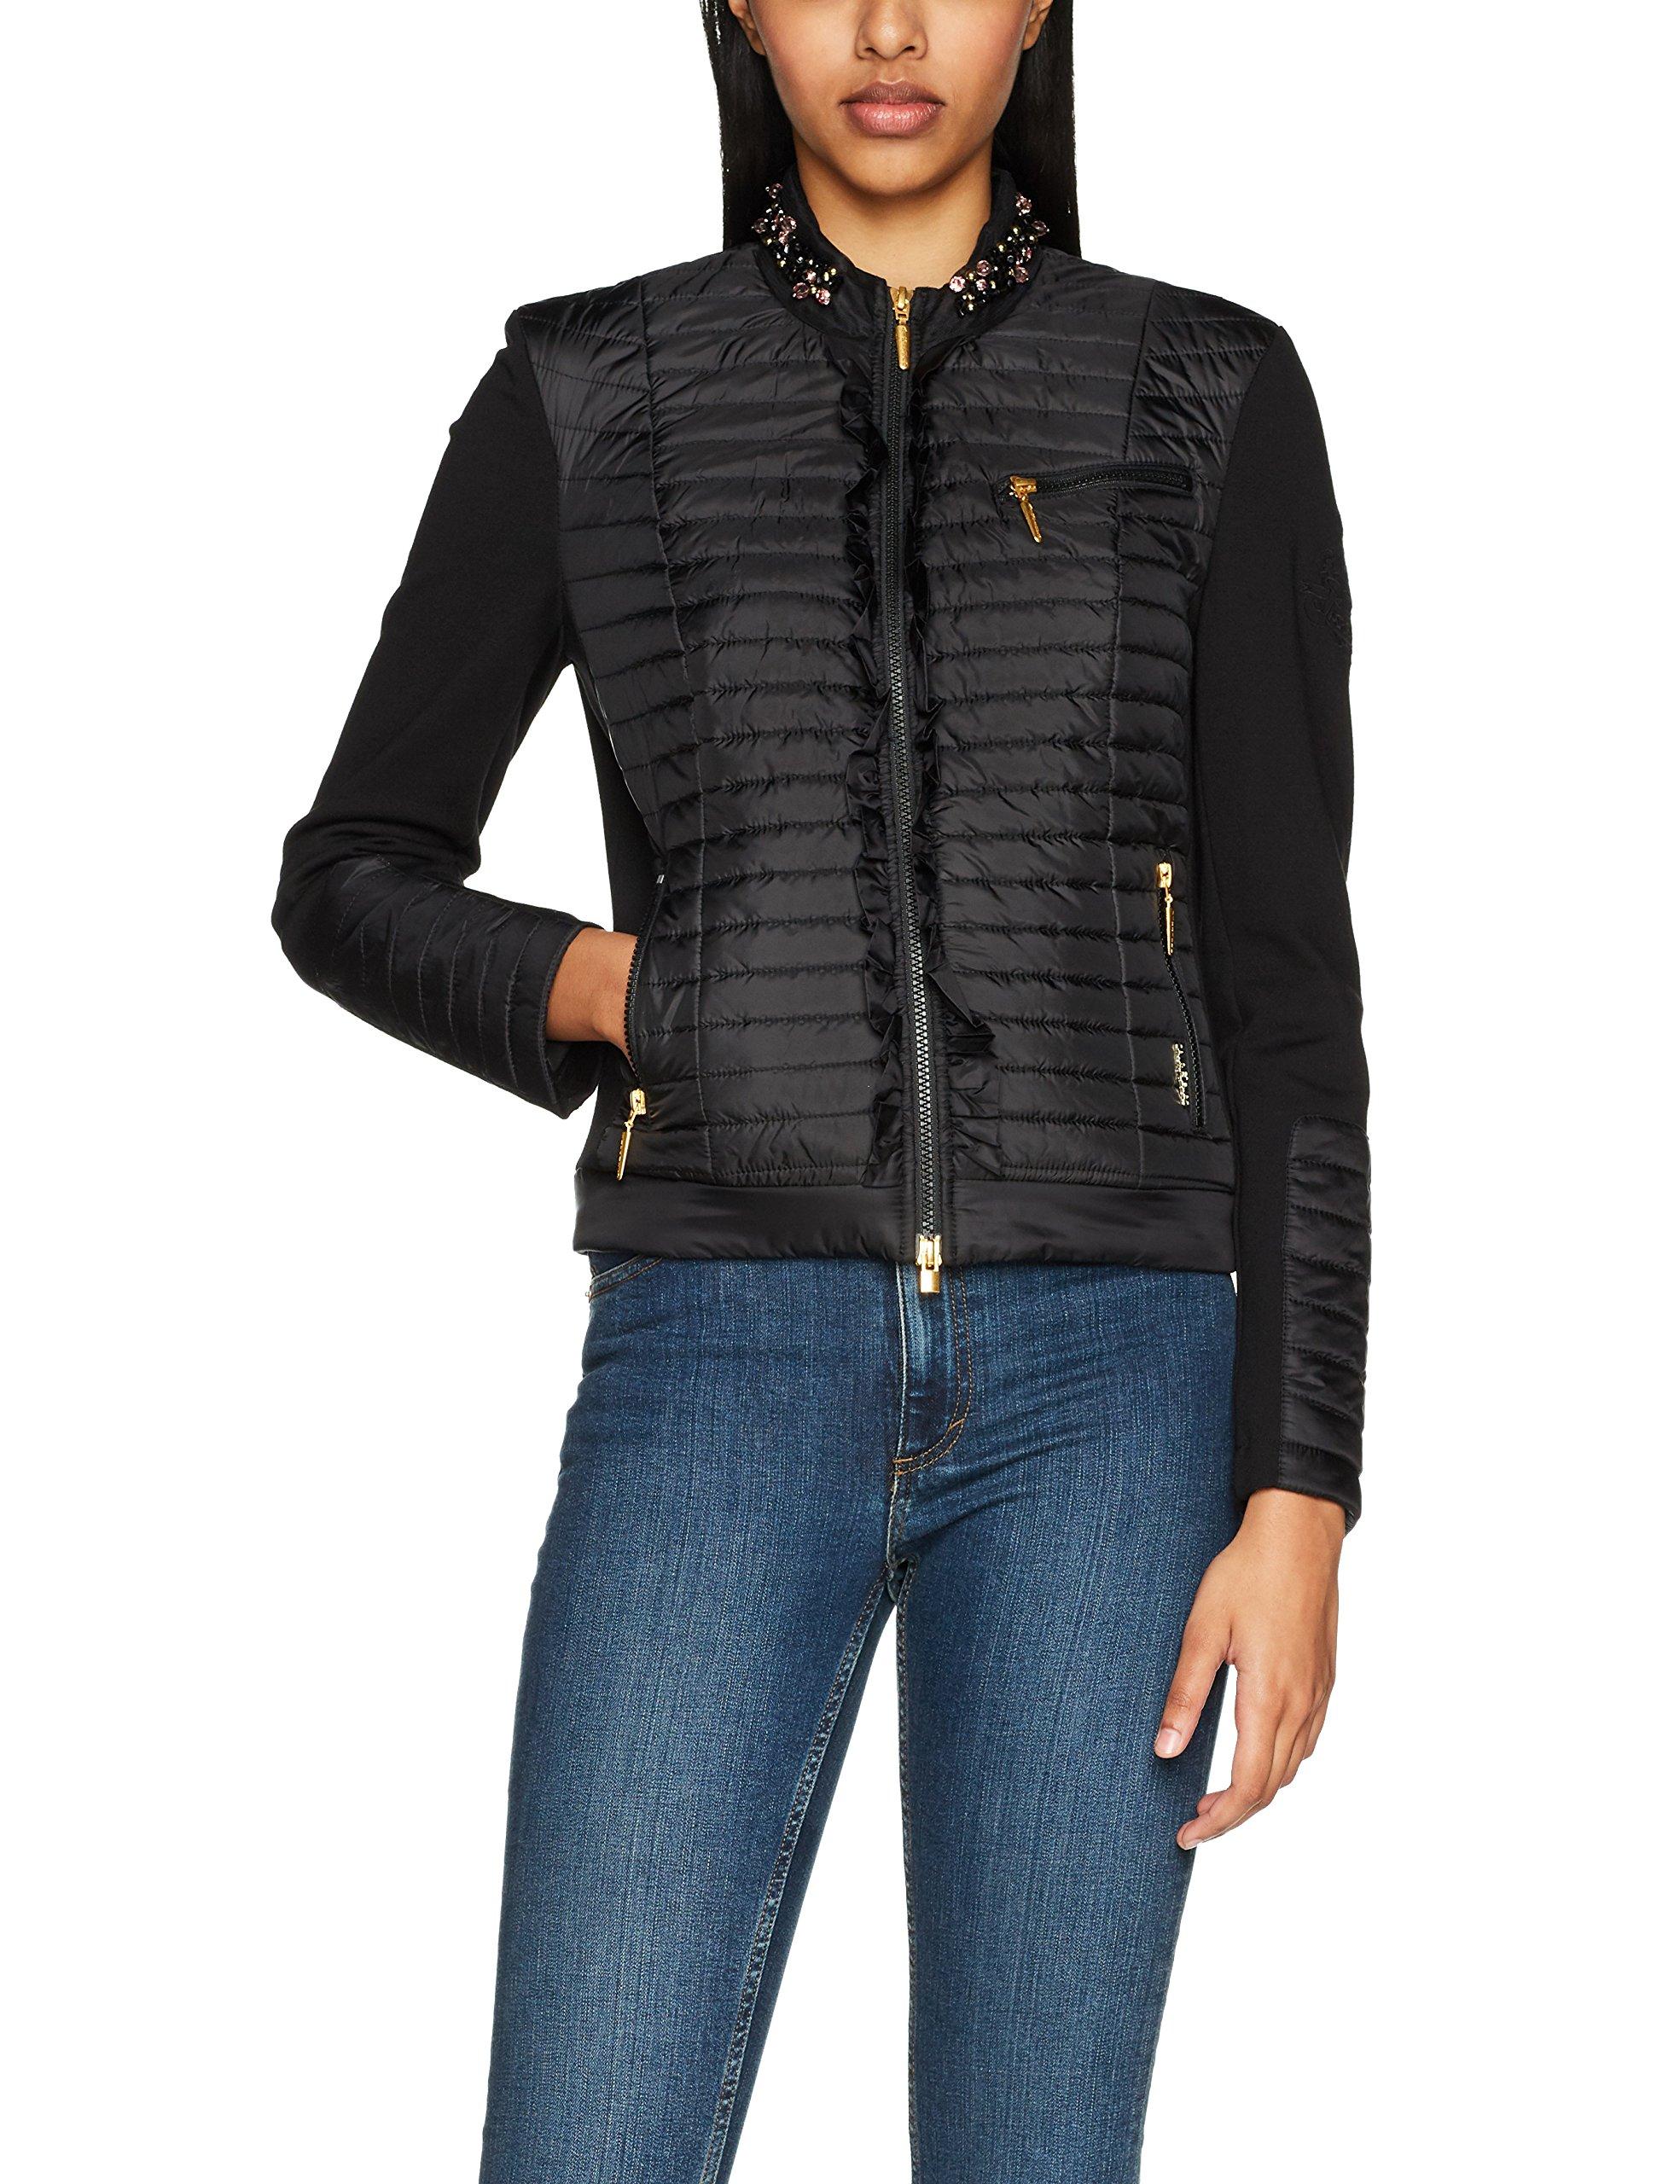 Airfield 0114 Femme bri Black jacket Sierra BlousonNoirjet VGLqUMSzp